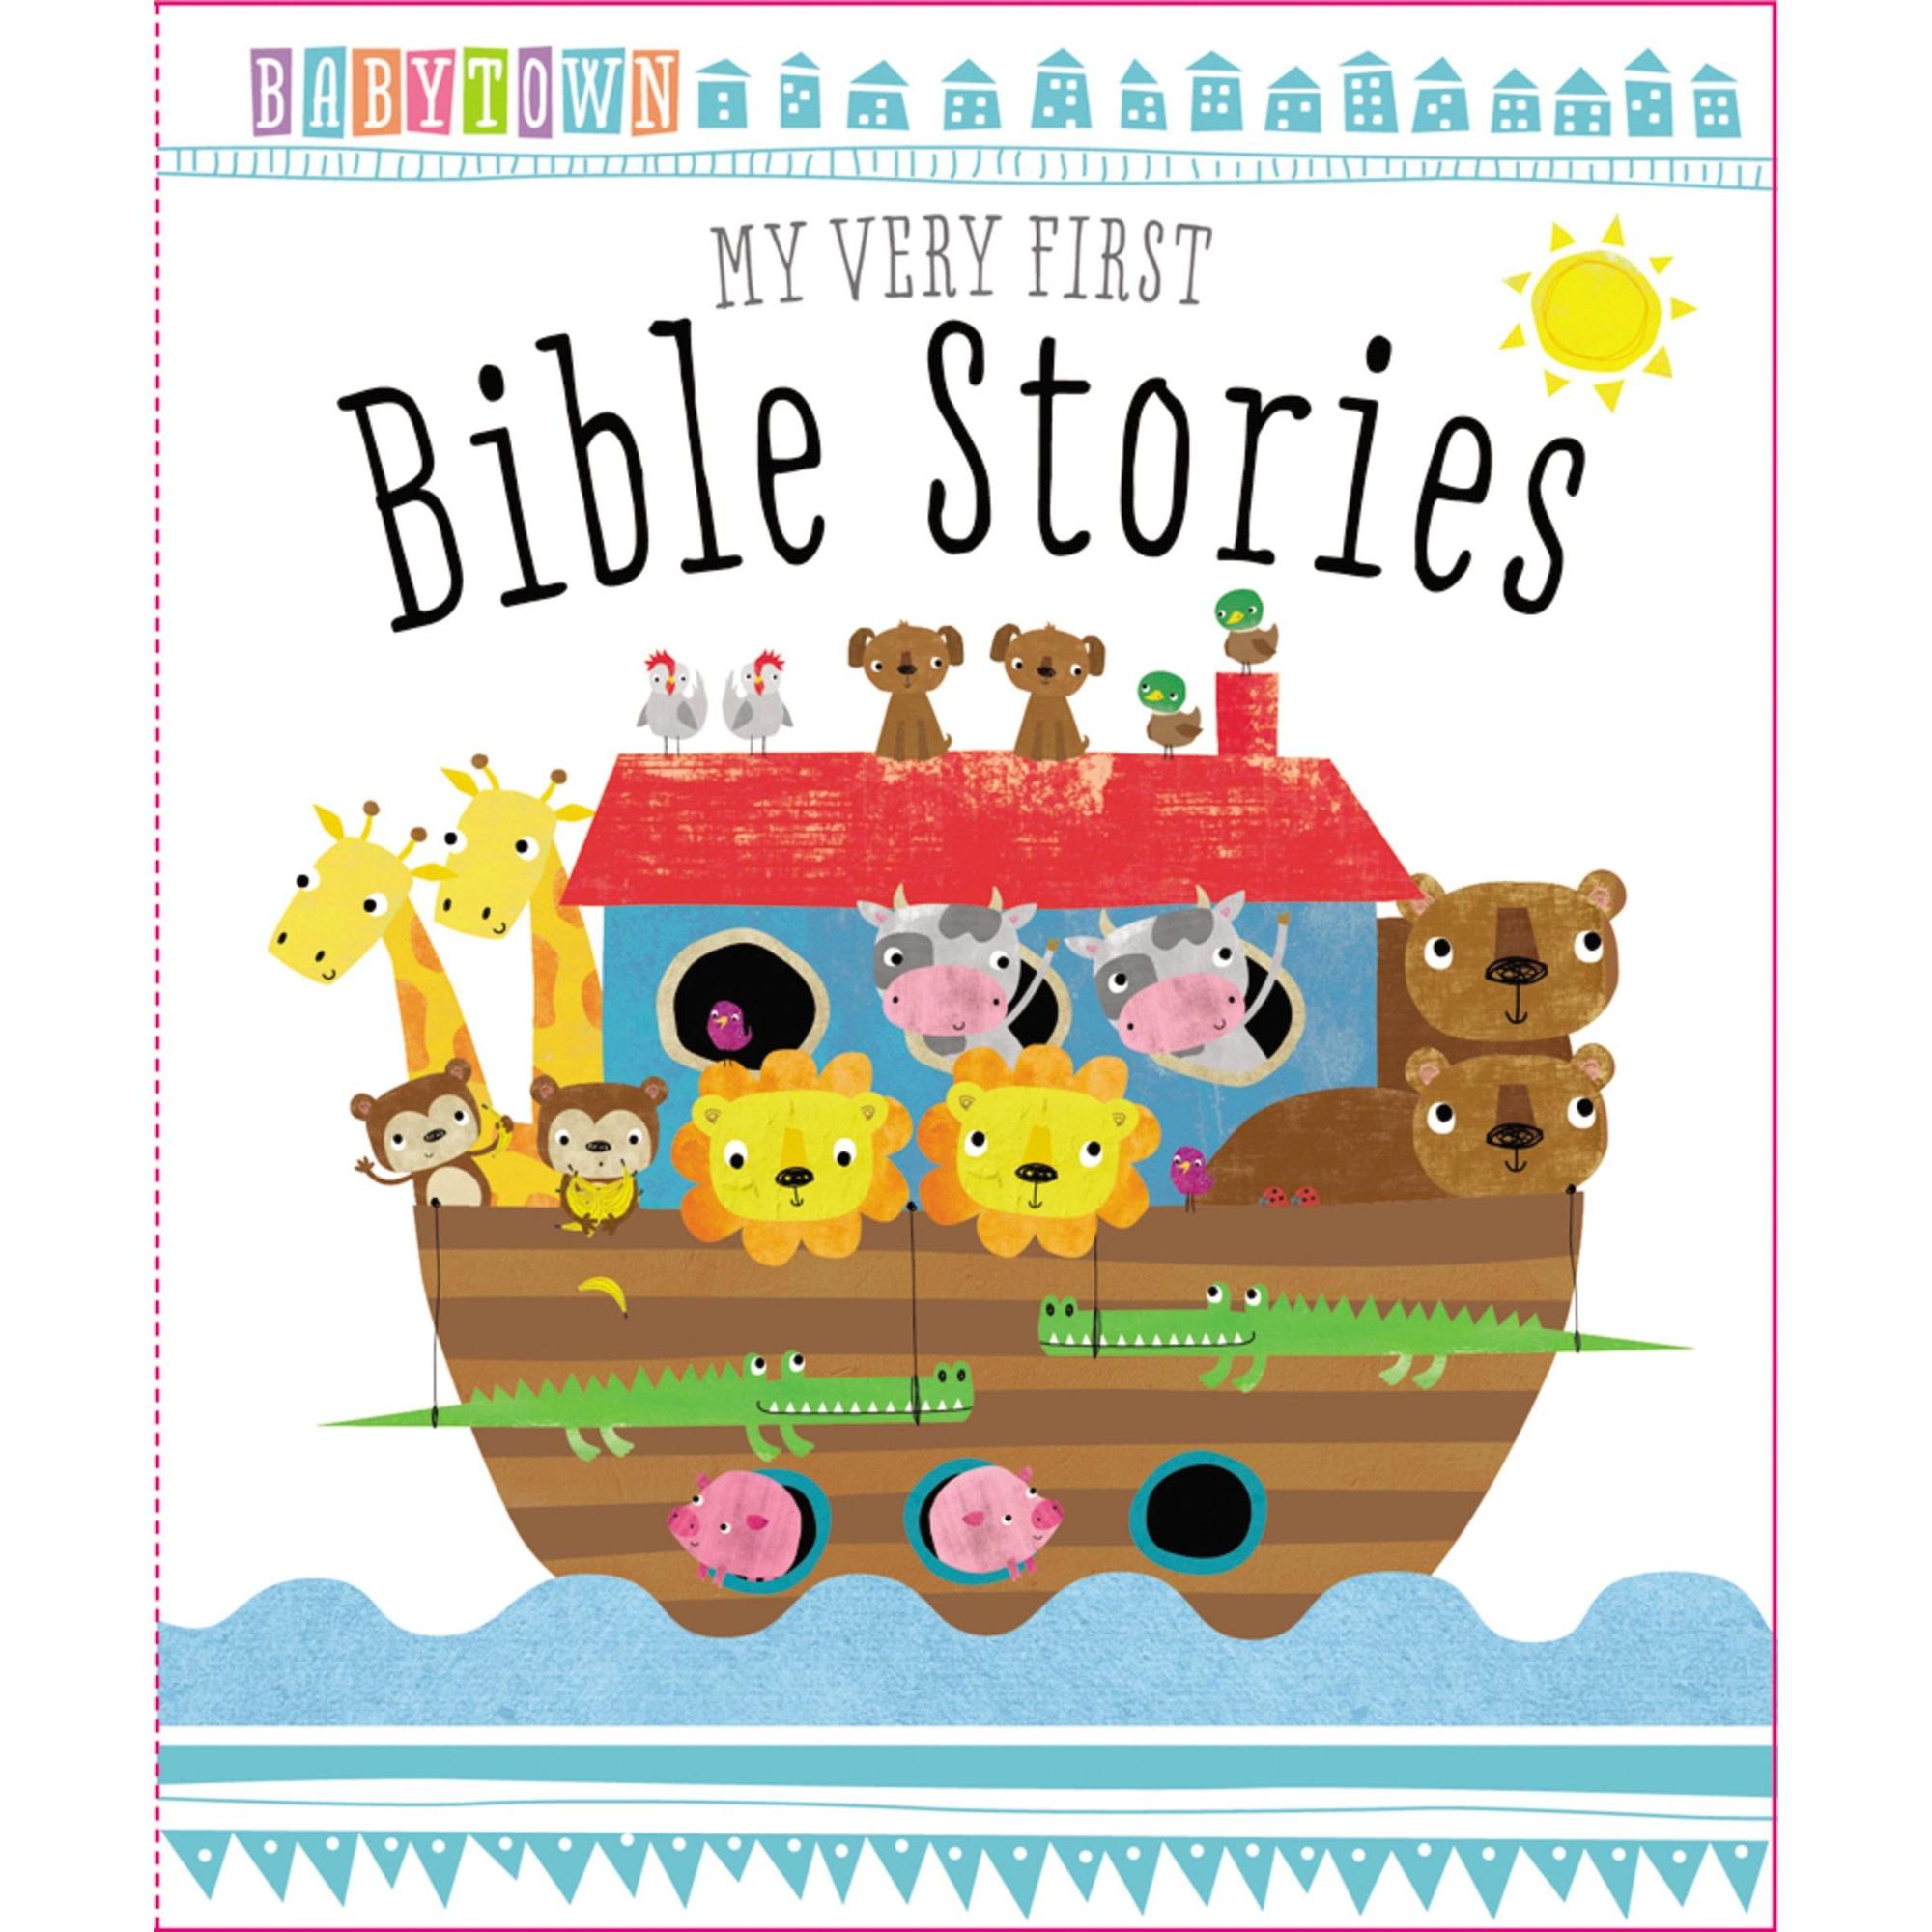 Babytown Bible Stories